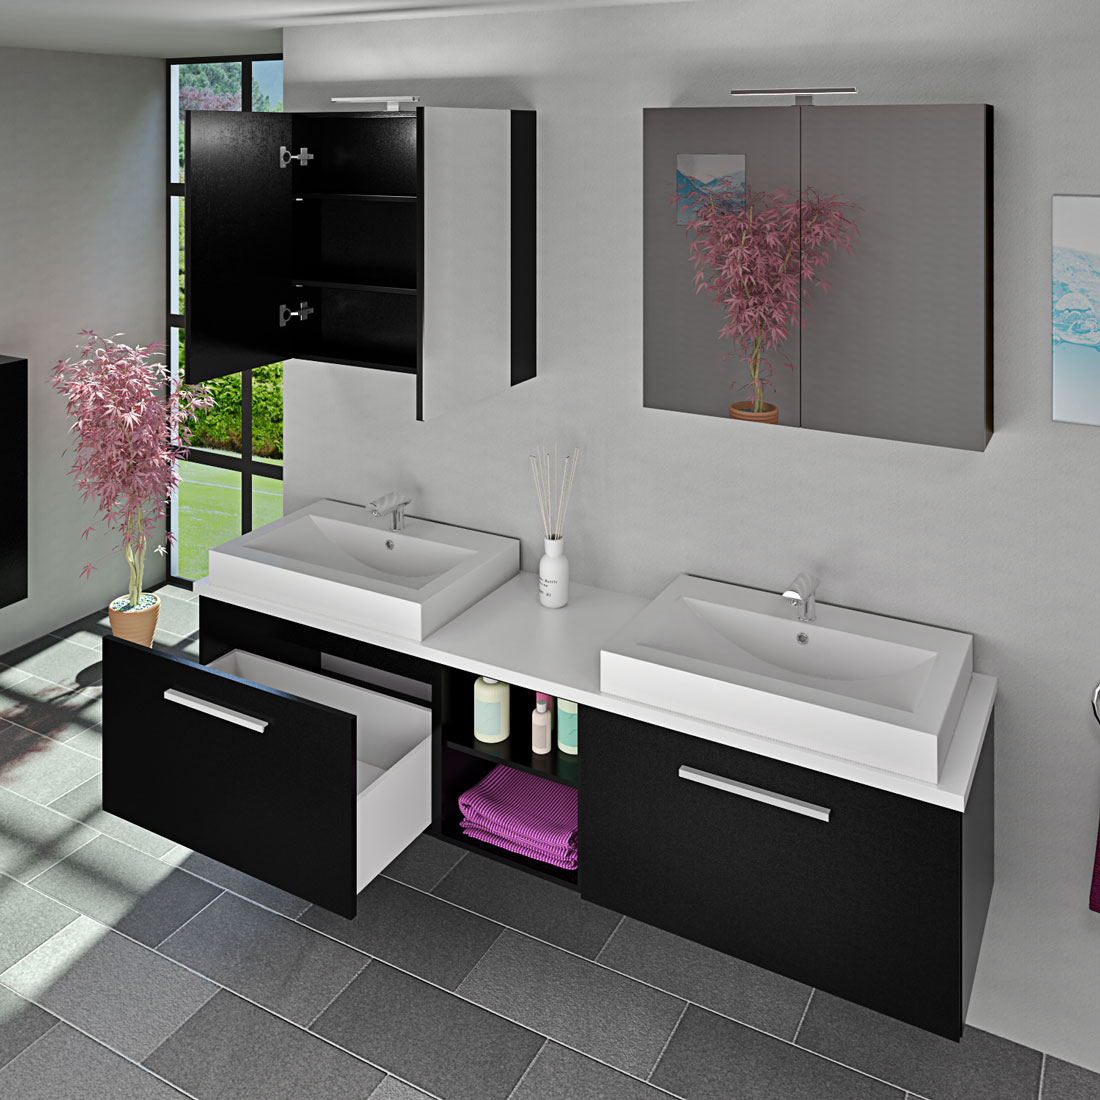 badm bel set city 306 v1 esche schwarz badezimmerm bel waschtisch 200cm. Black Bedroom Furniture Sets. Home Design Ideas